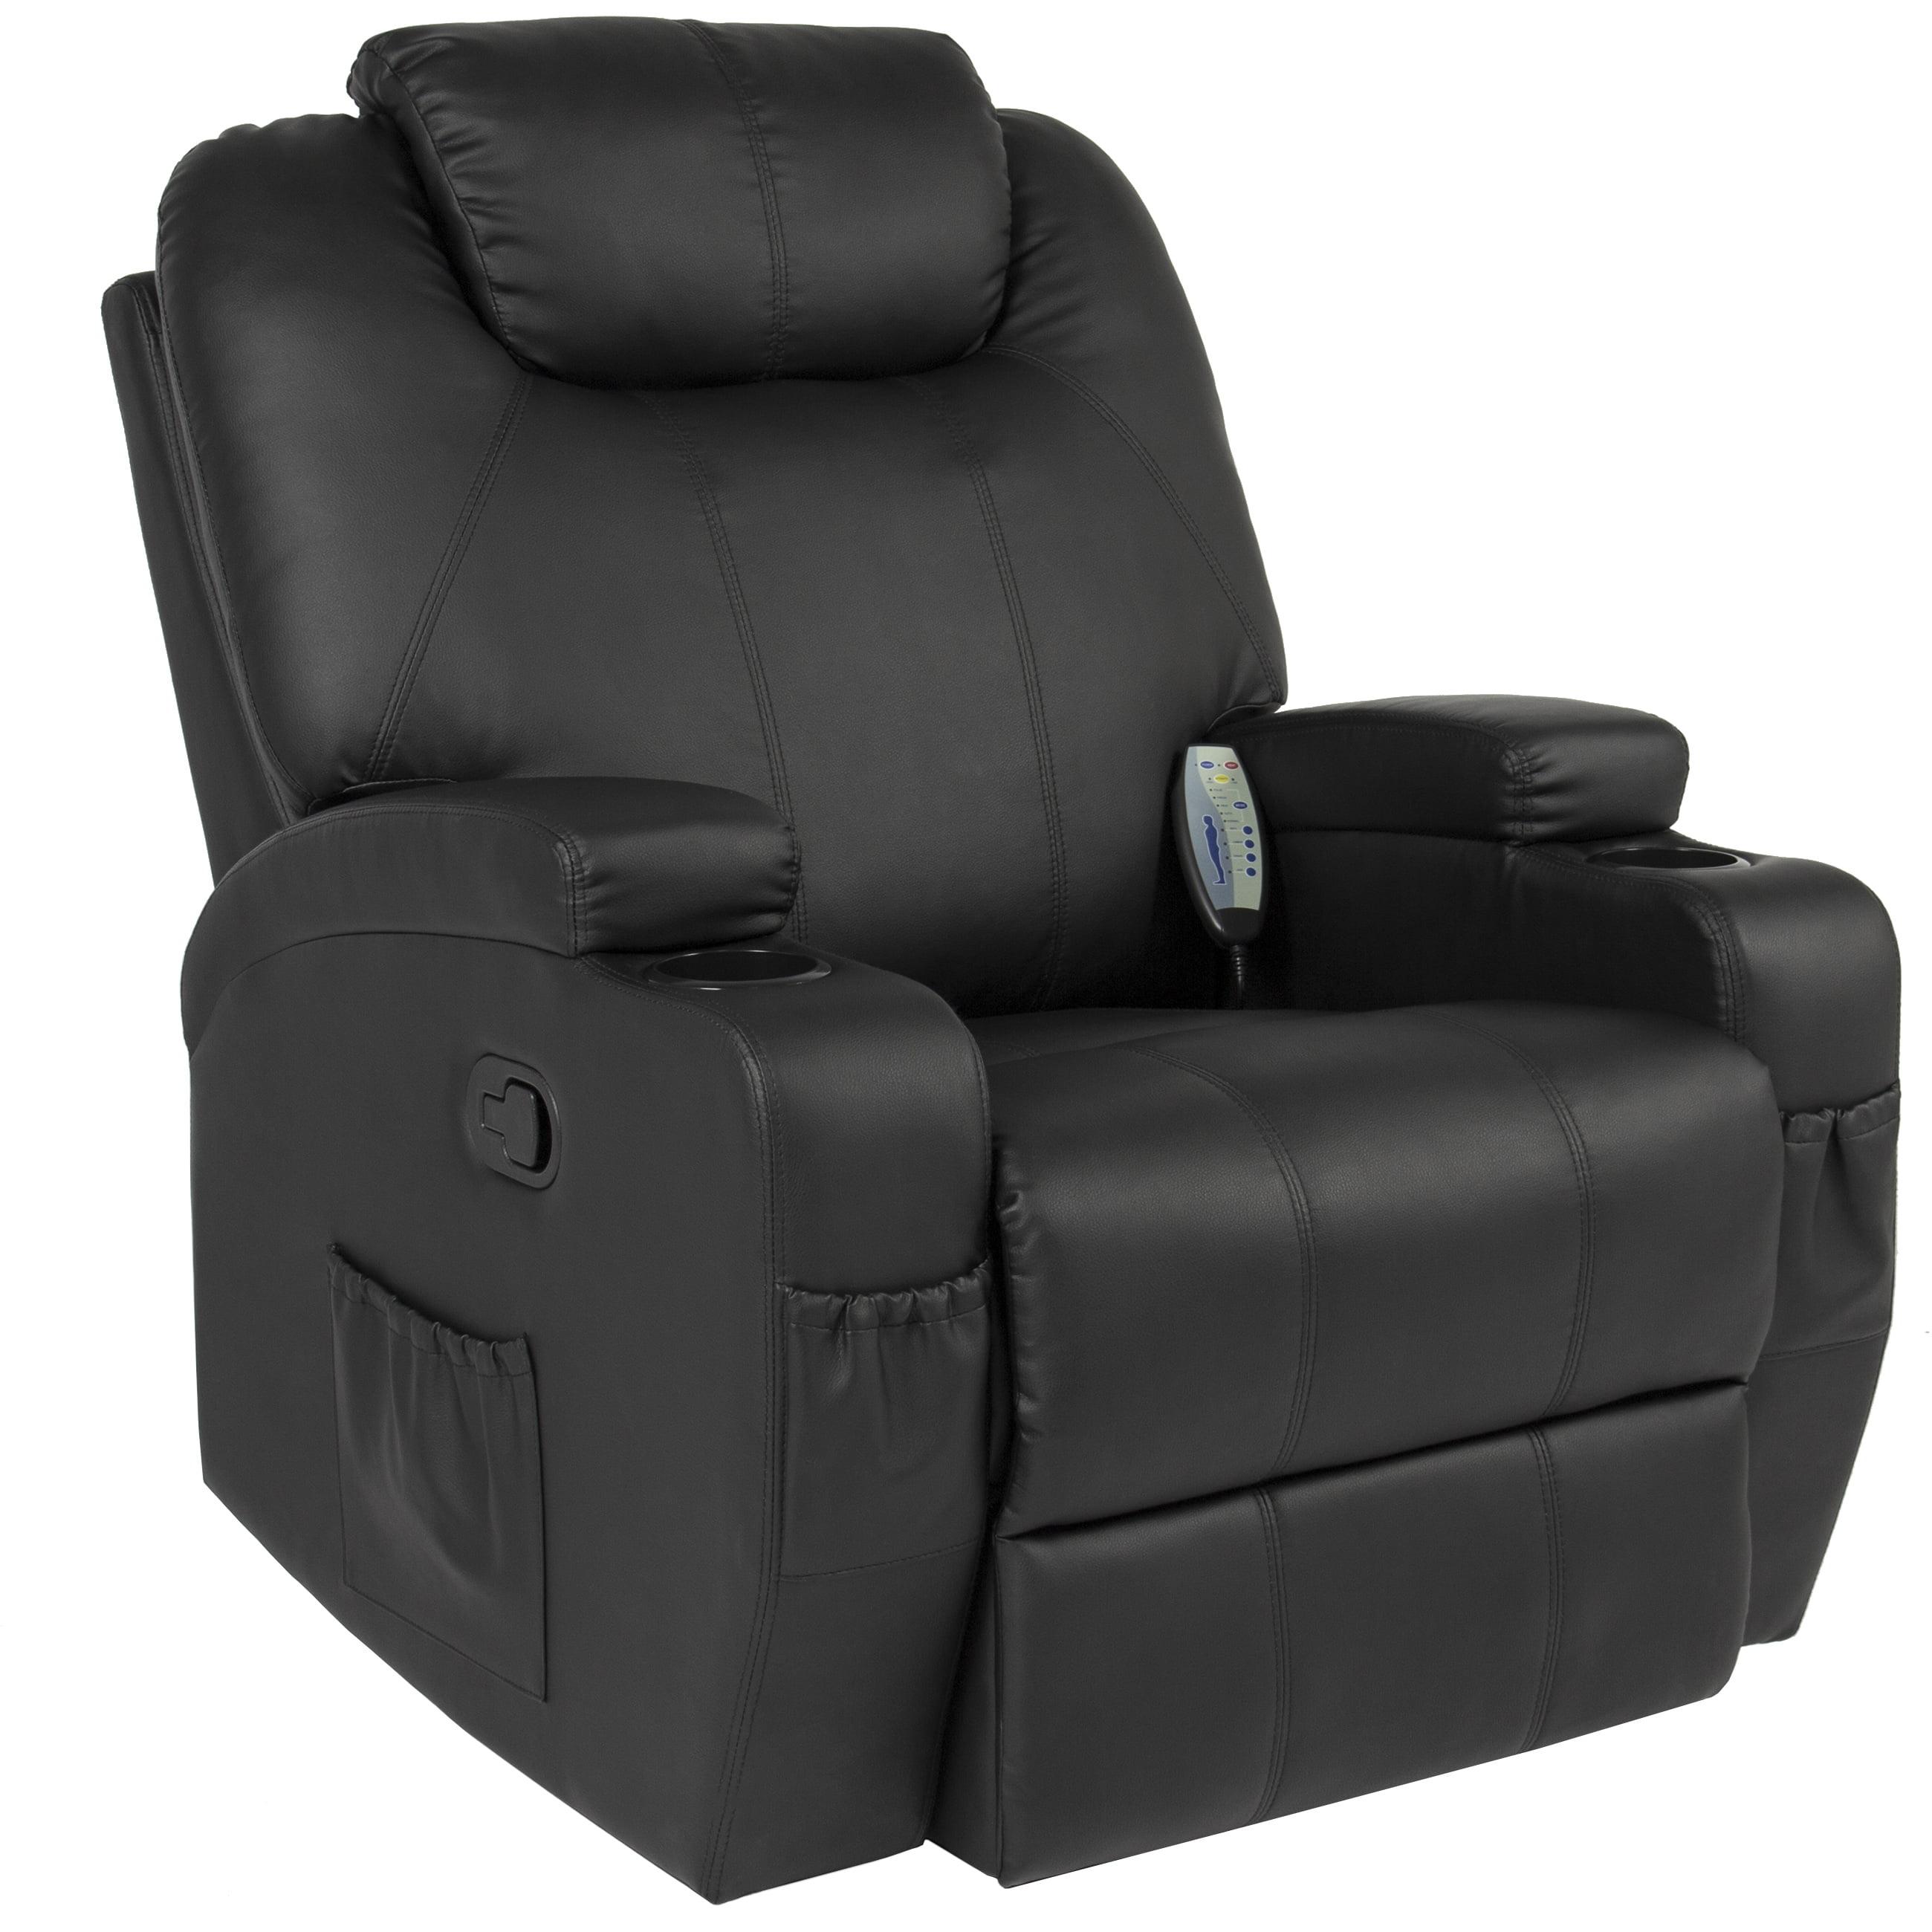 Massage Recliner Sofa Chair Heated W Control Ergonomic Executive